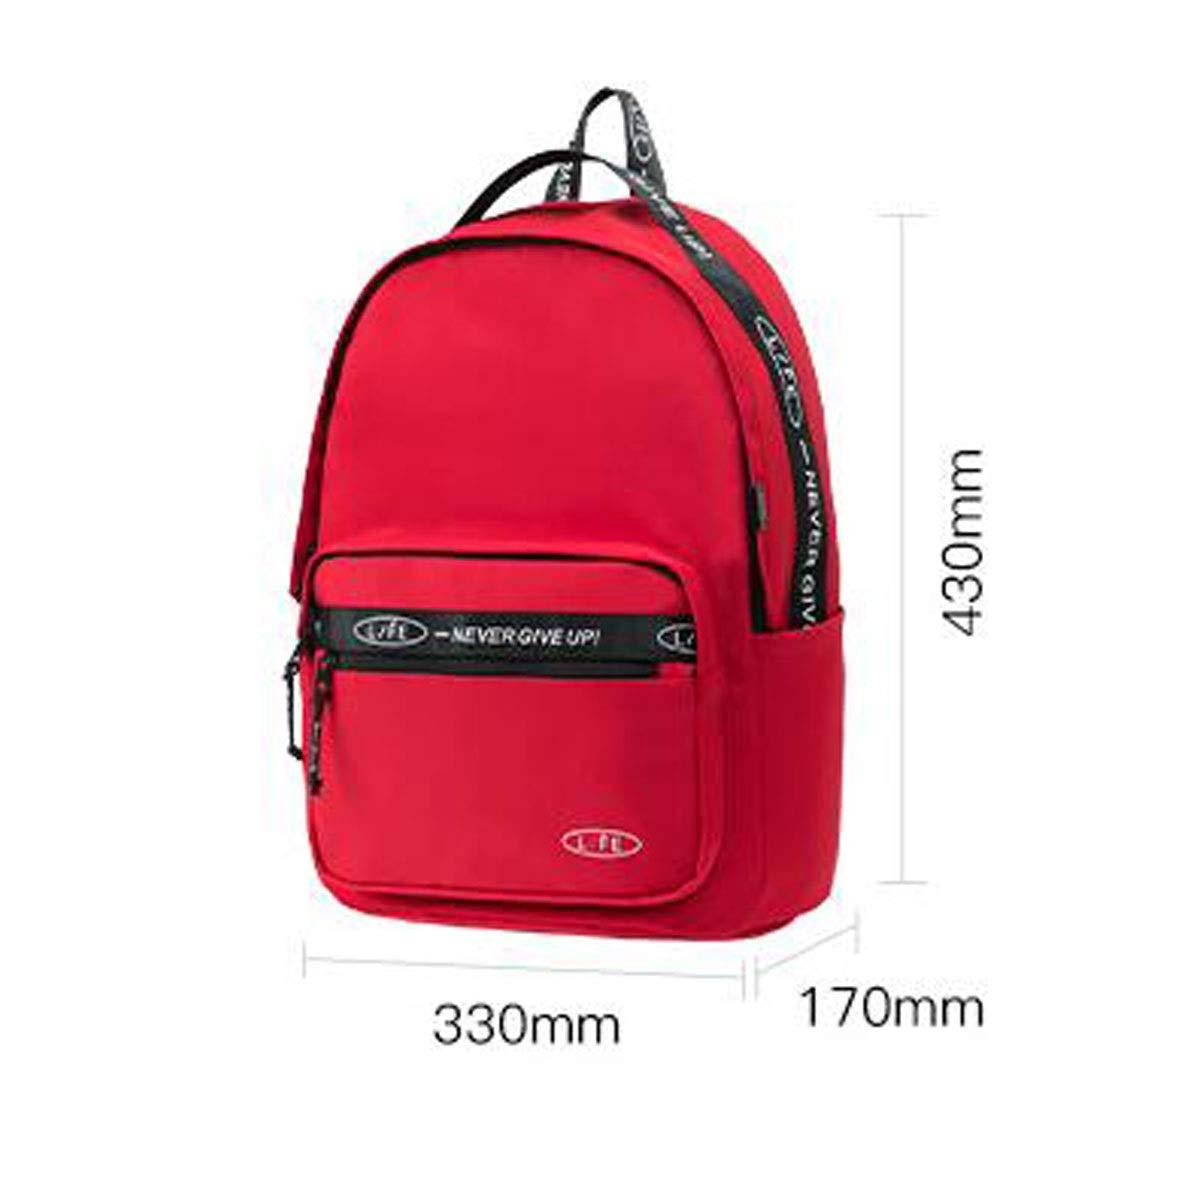 Nylon Fabric Computer Backpack Male and Female Student Bag ZHONGYUE Large-Capacity Backpack